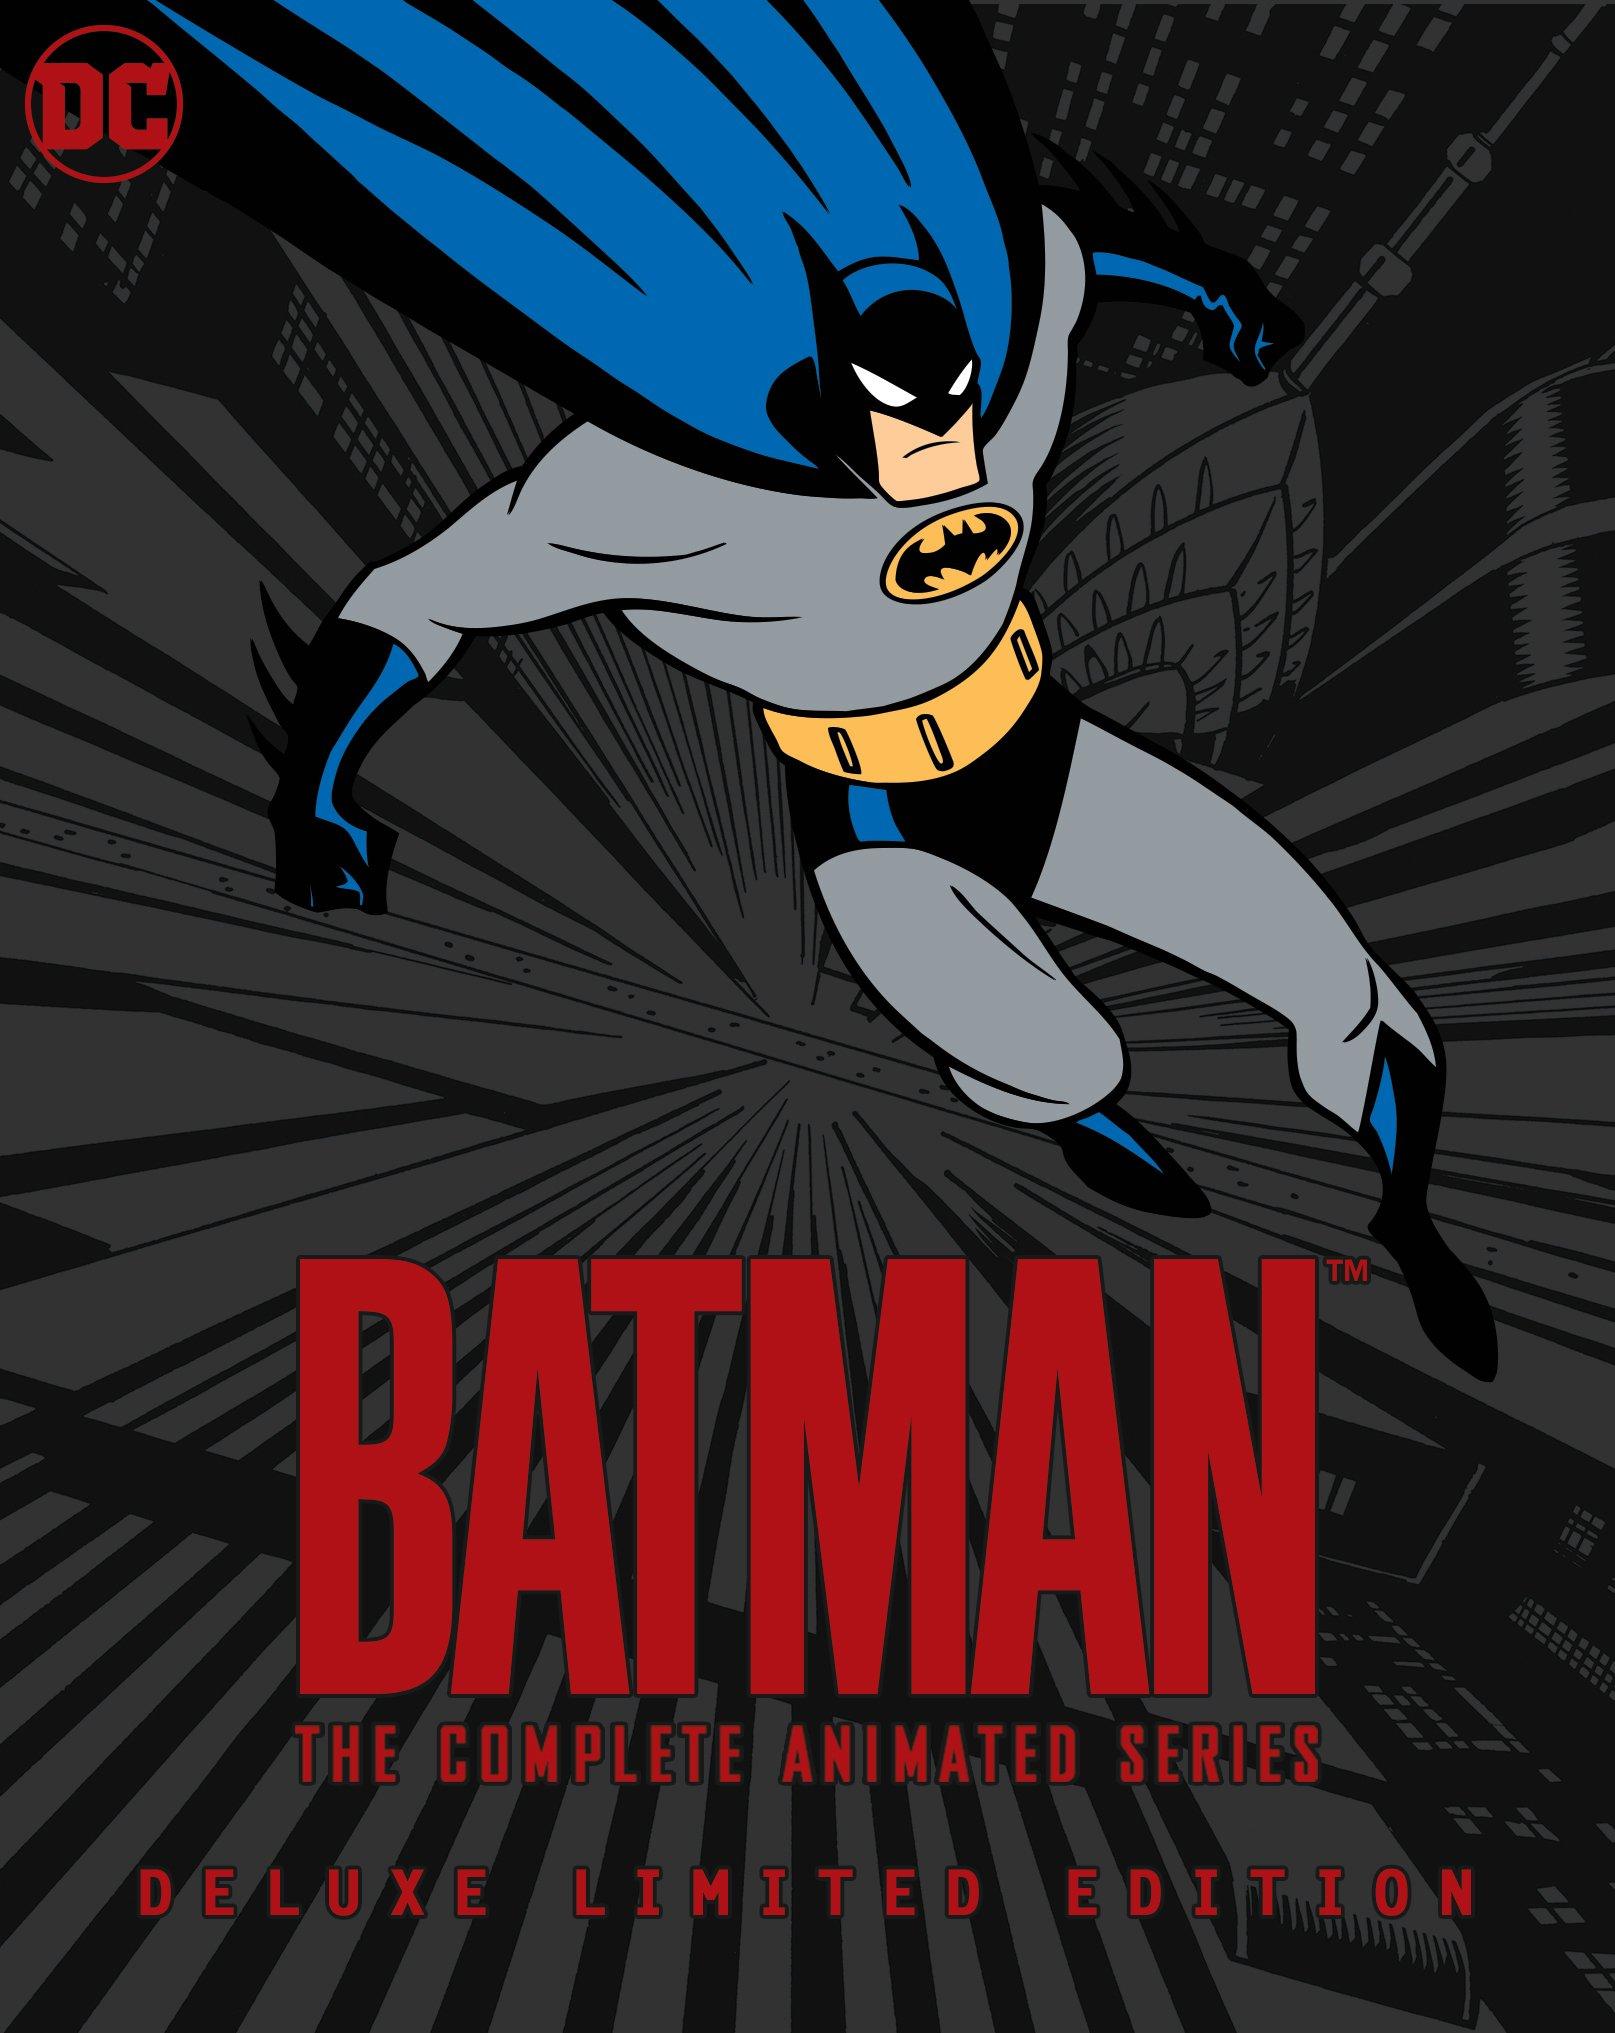 Buy Batman Animated Complete Now!